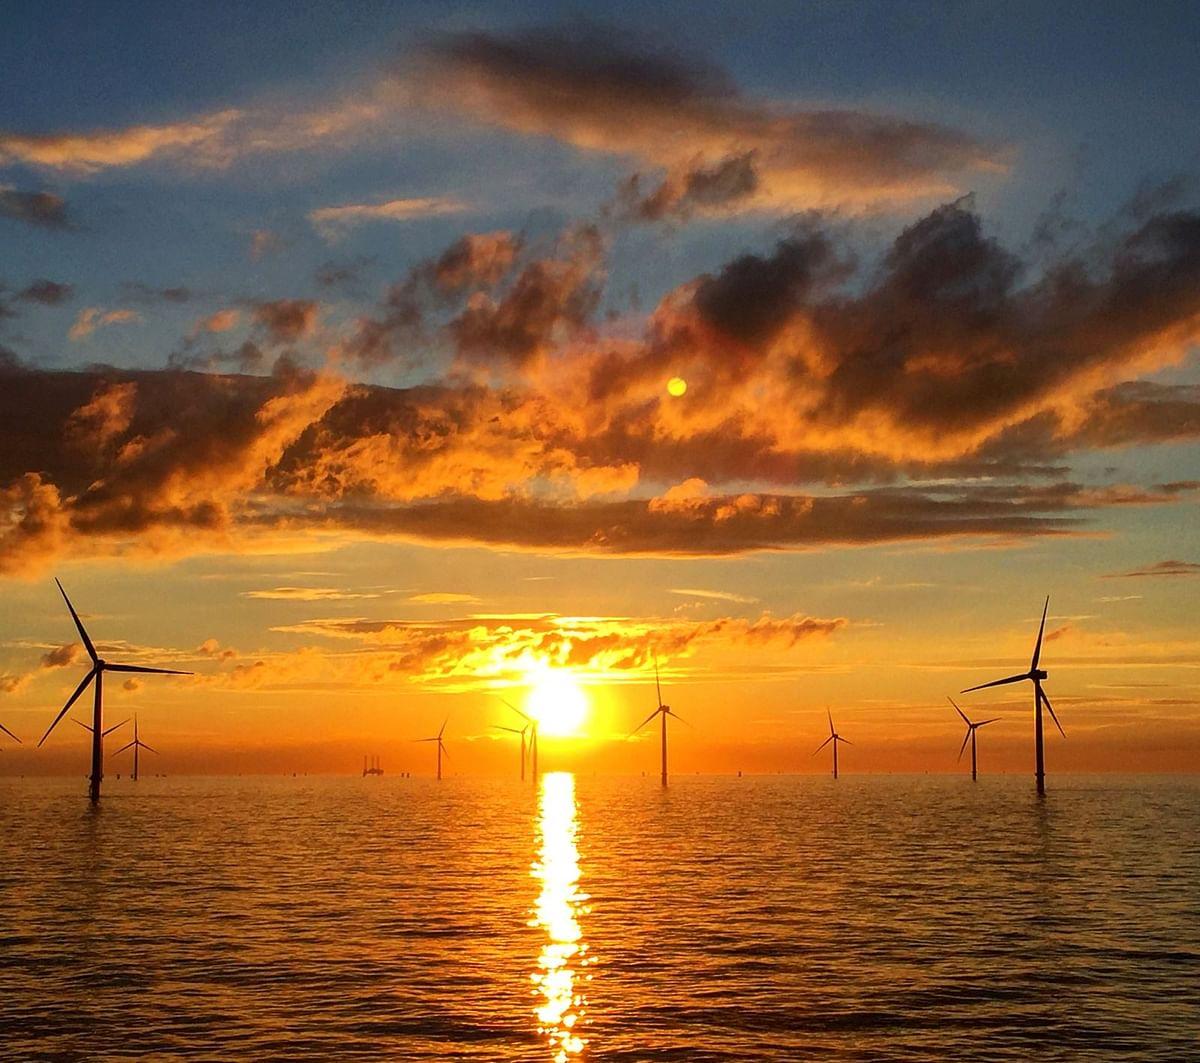 Siemens Gamesa Turbines for Wind Farm in Philippines